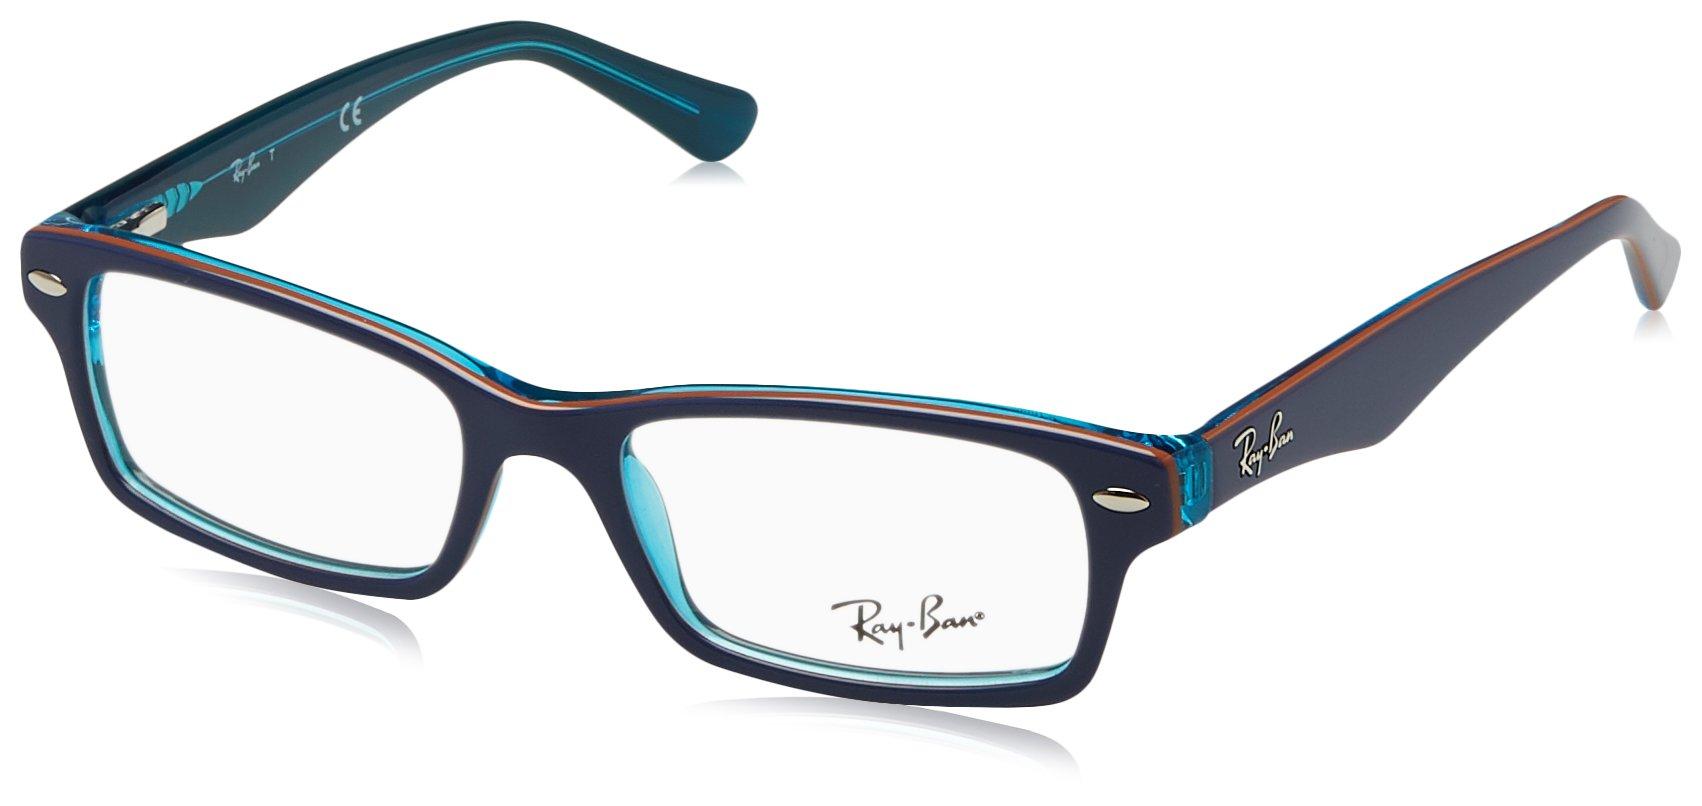 Ray Ban Junior RY1530 Eyeglasses-3587 Top Blue on Azure Transparent-46mm